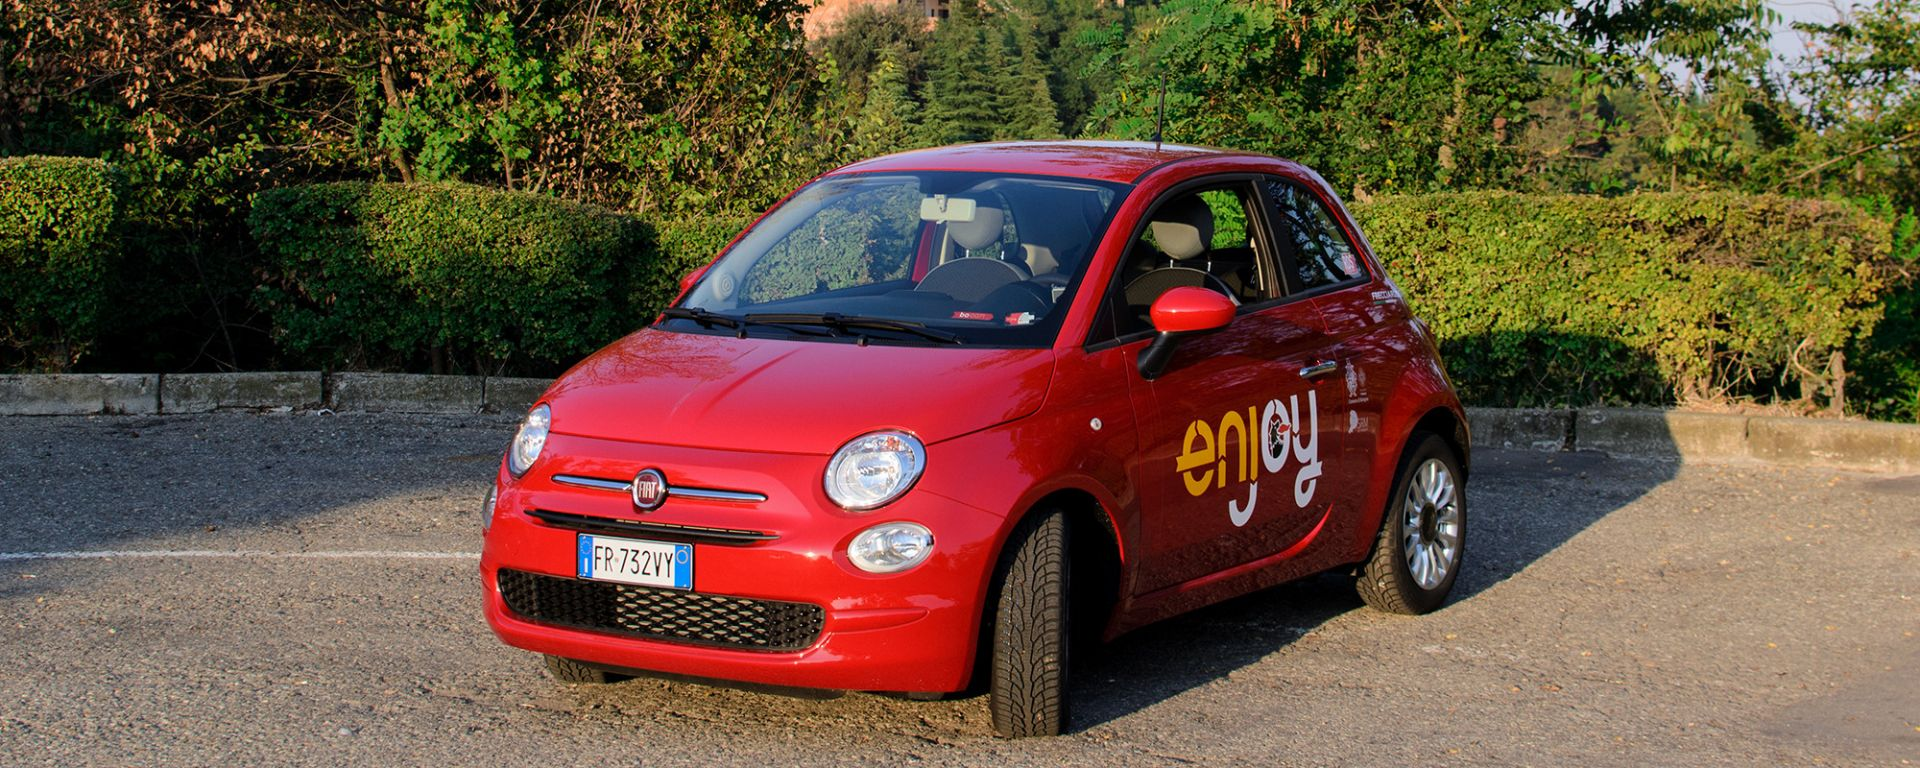 Waze e Enjoy insieme contro il traffico